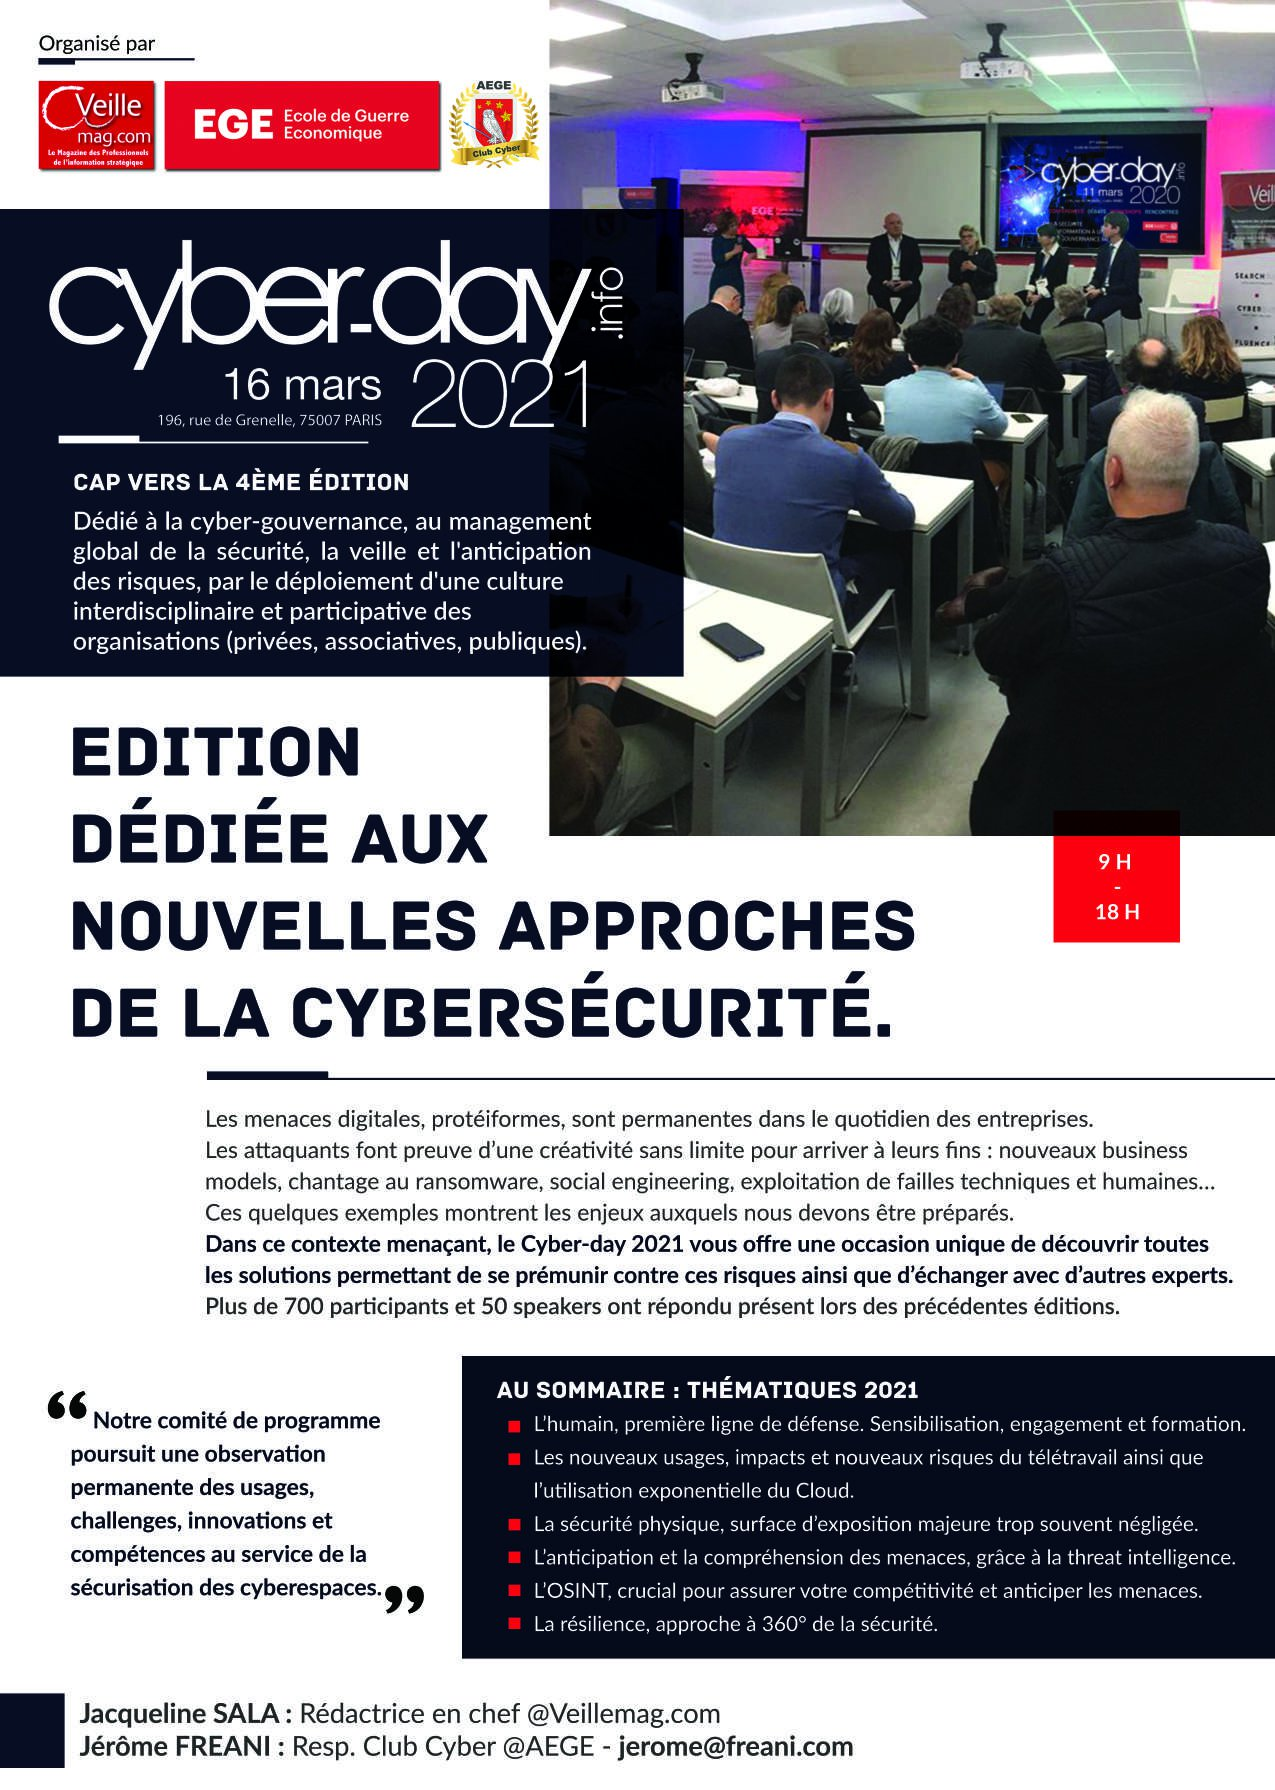 Cyberday, votre événement